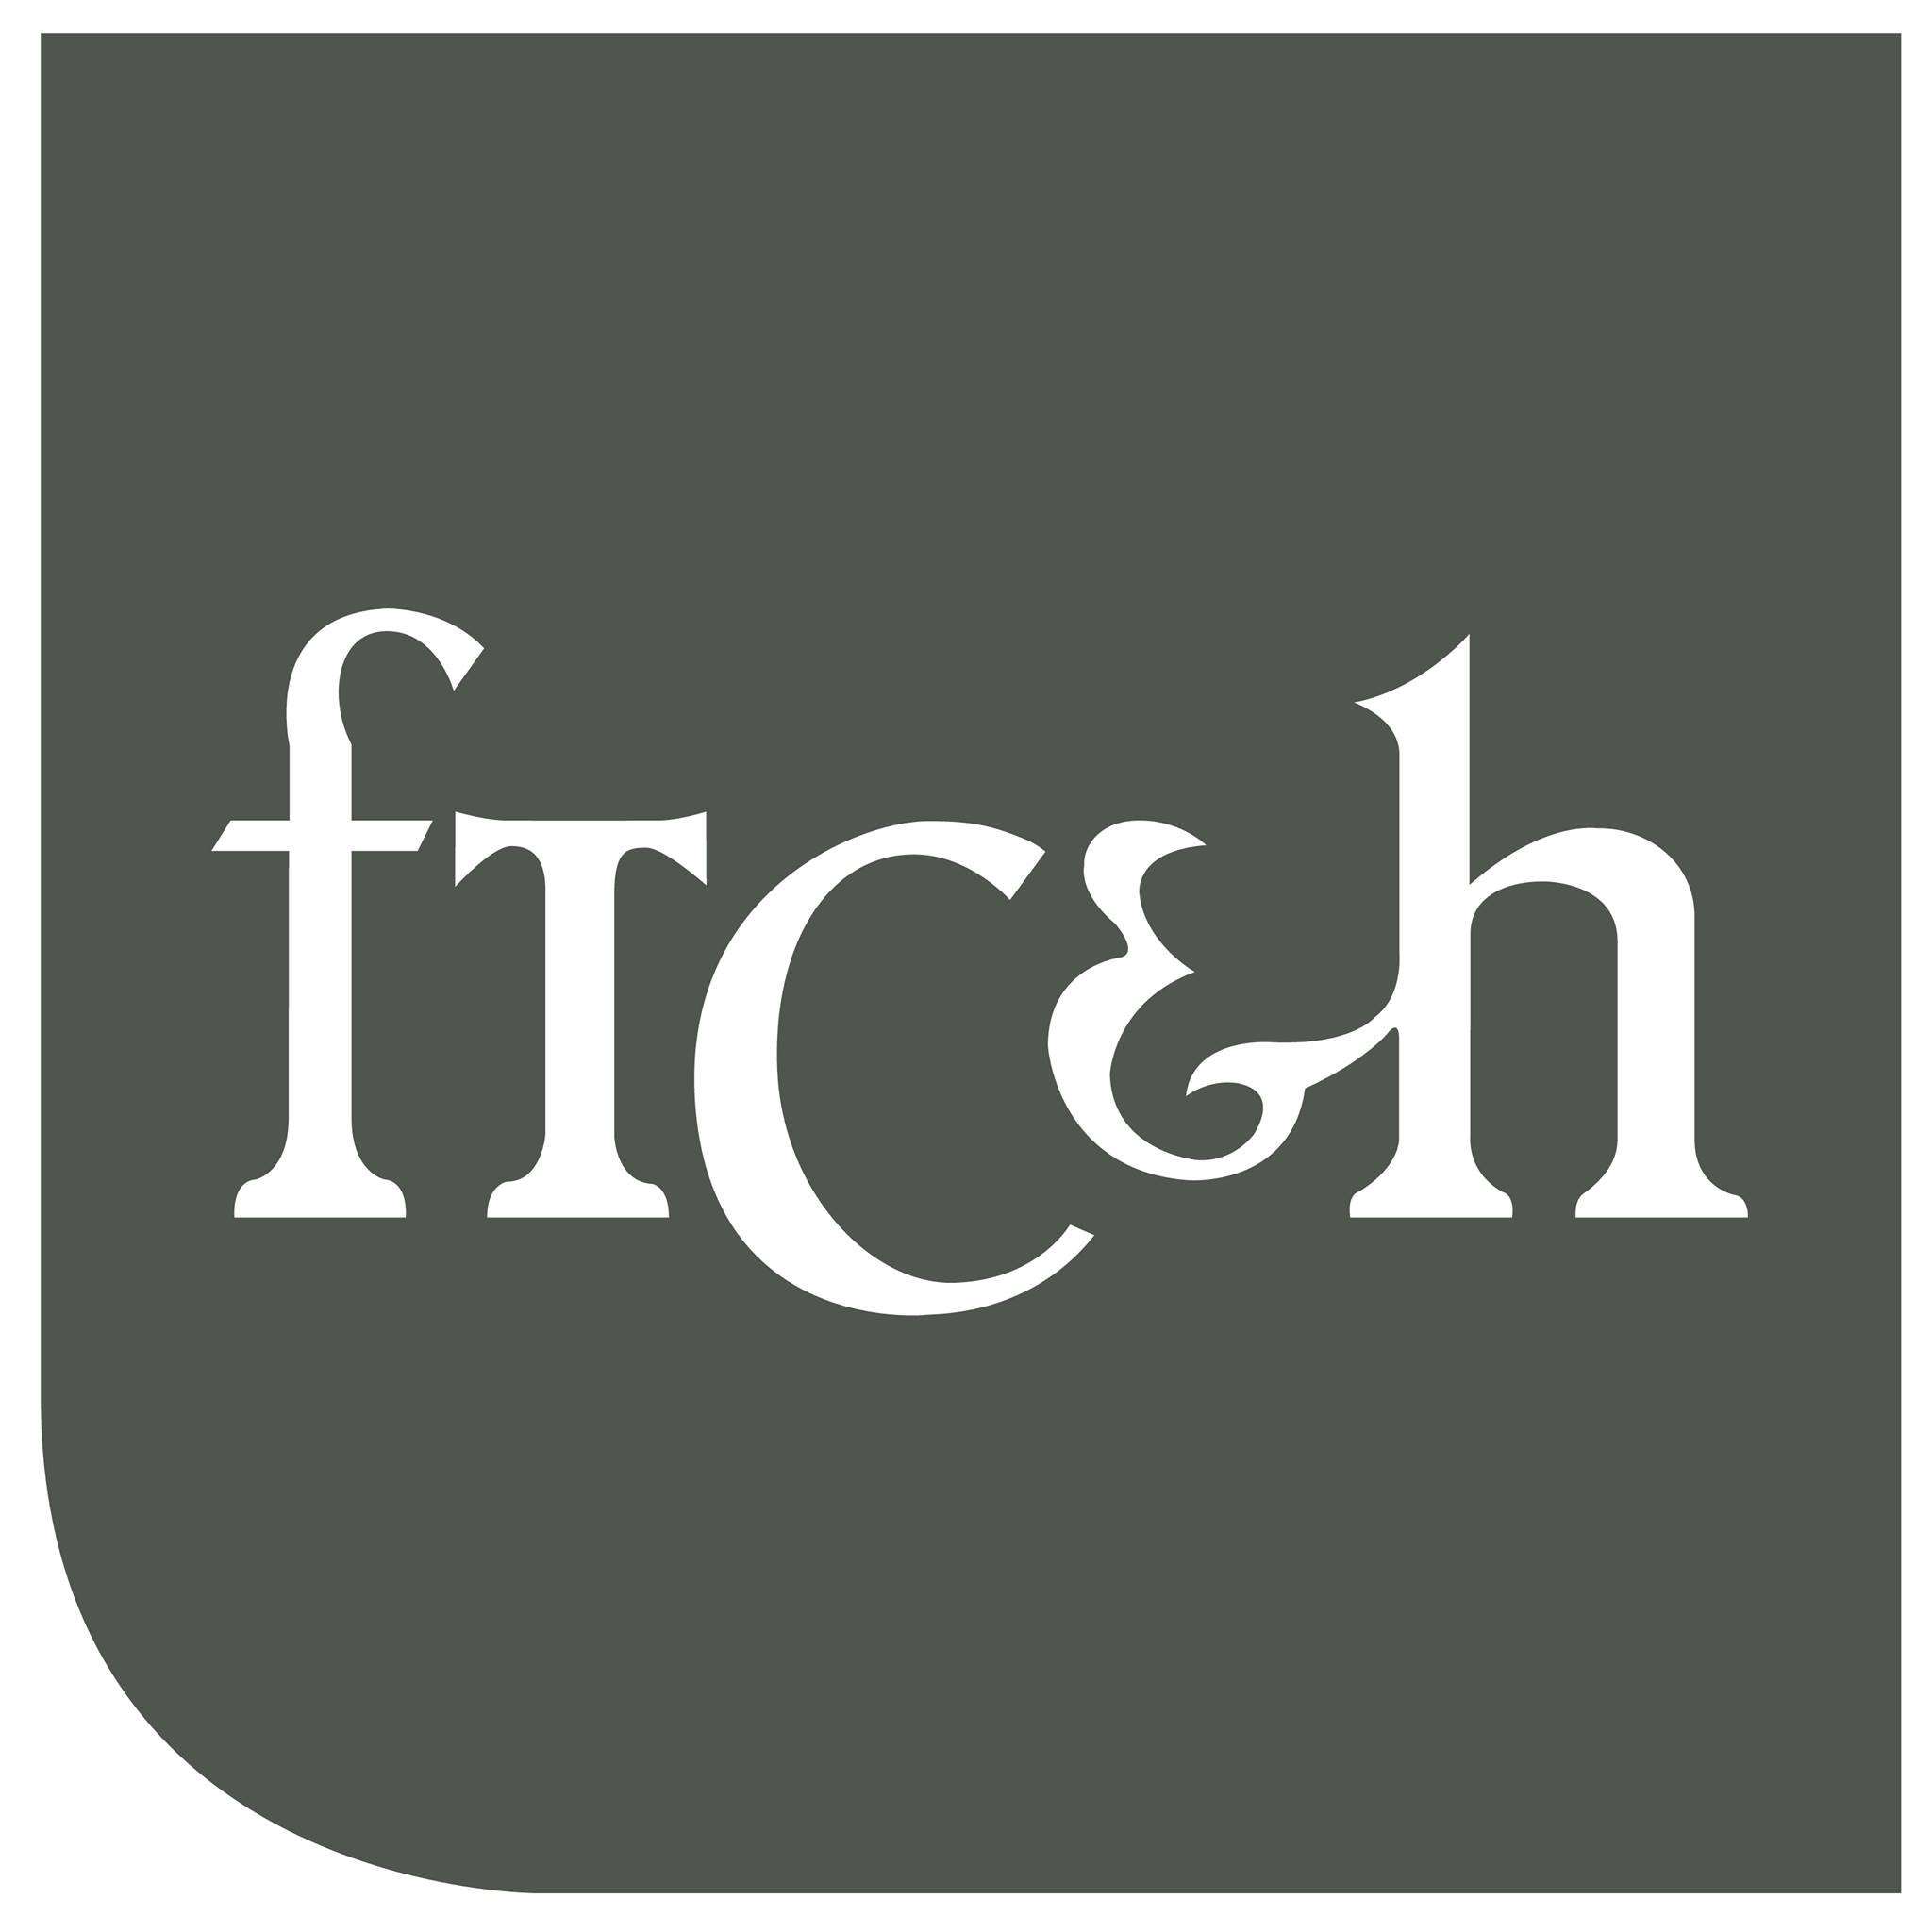 ftc&h.jpg